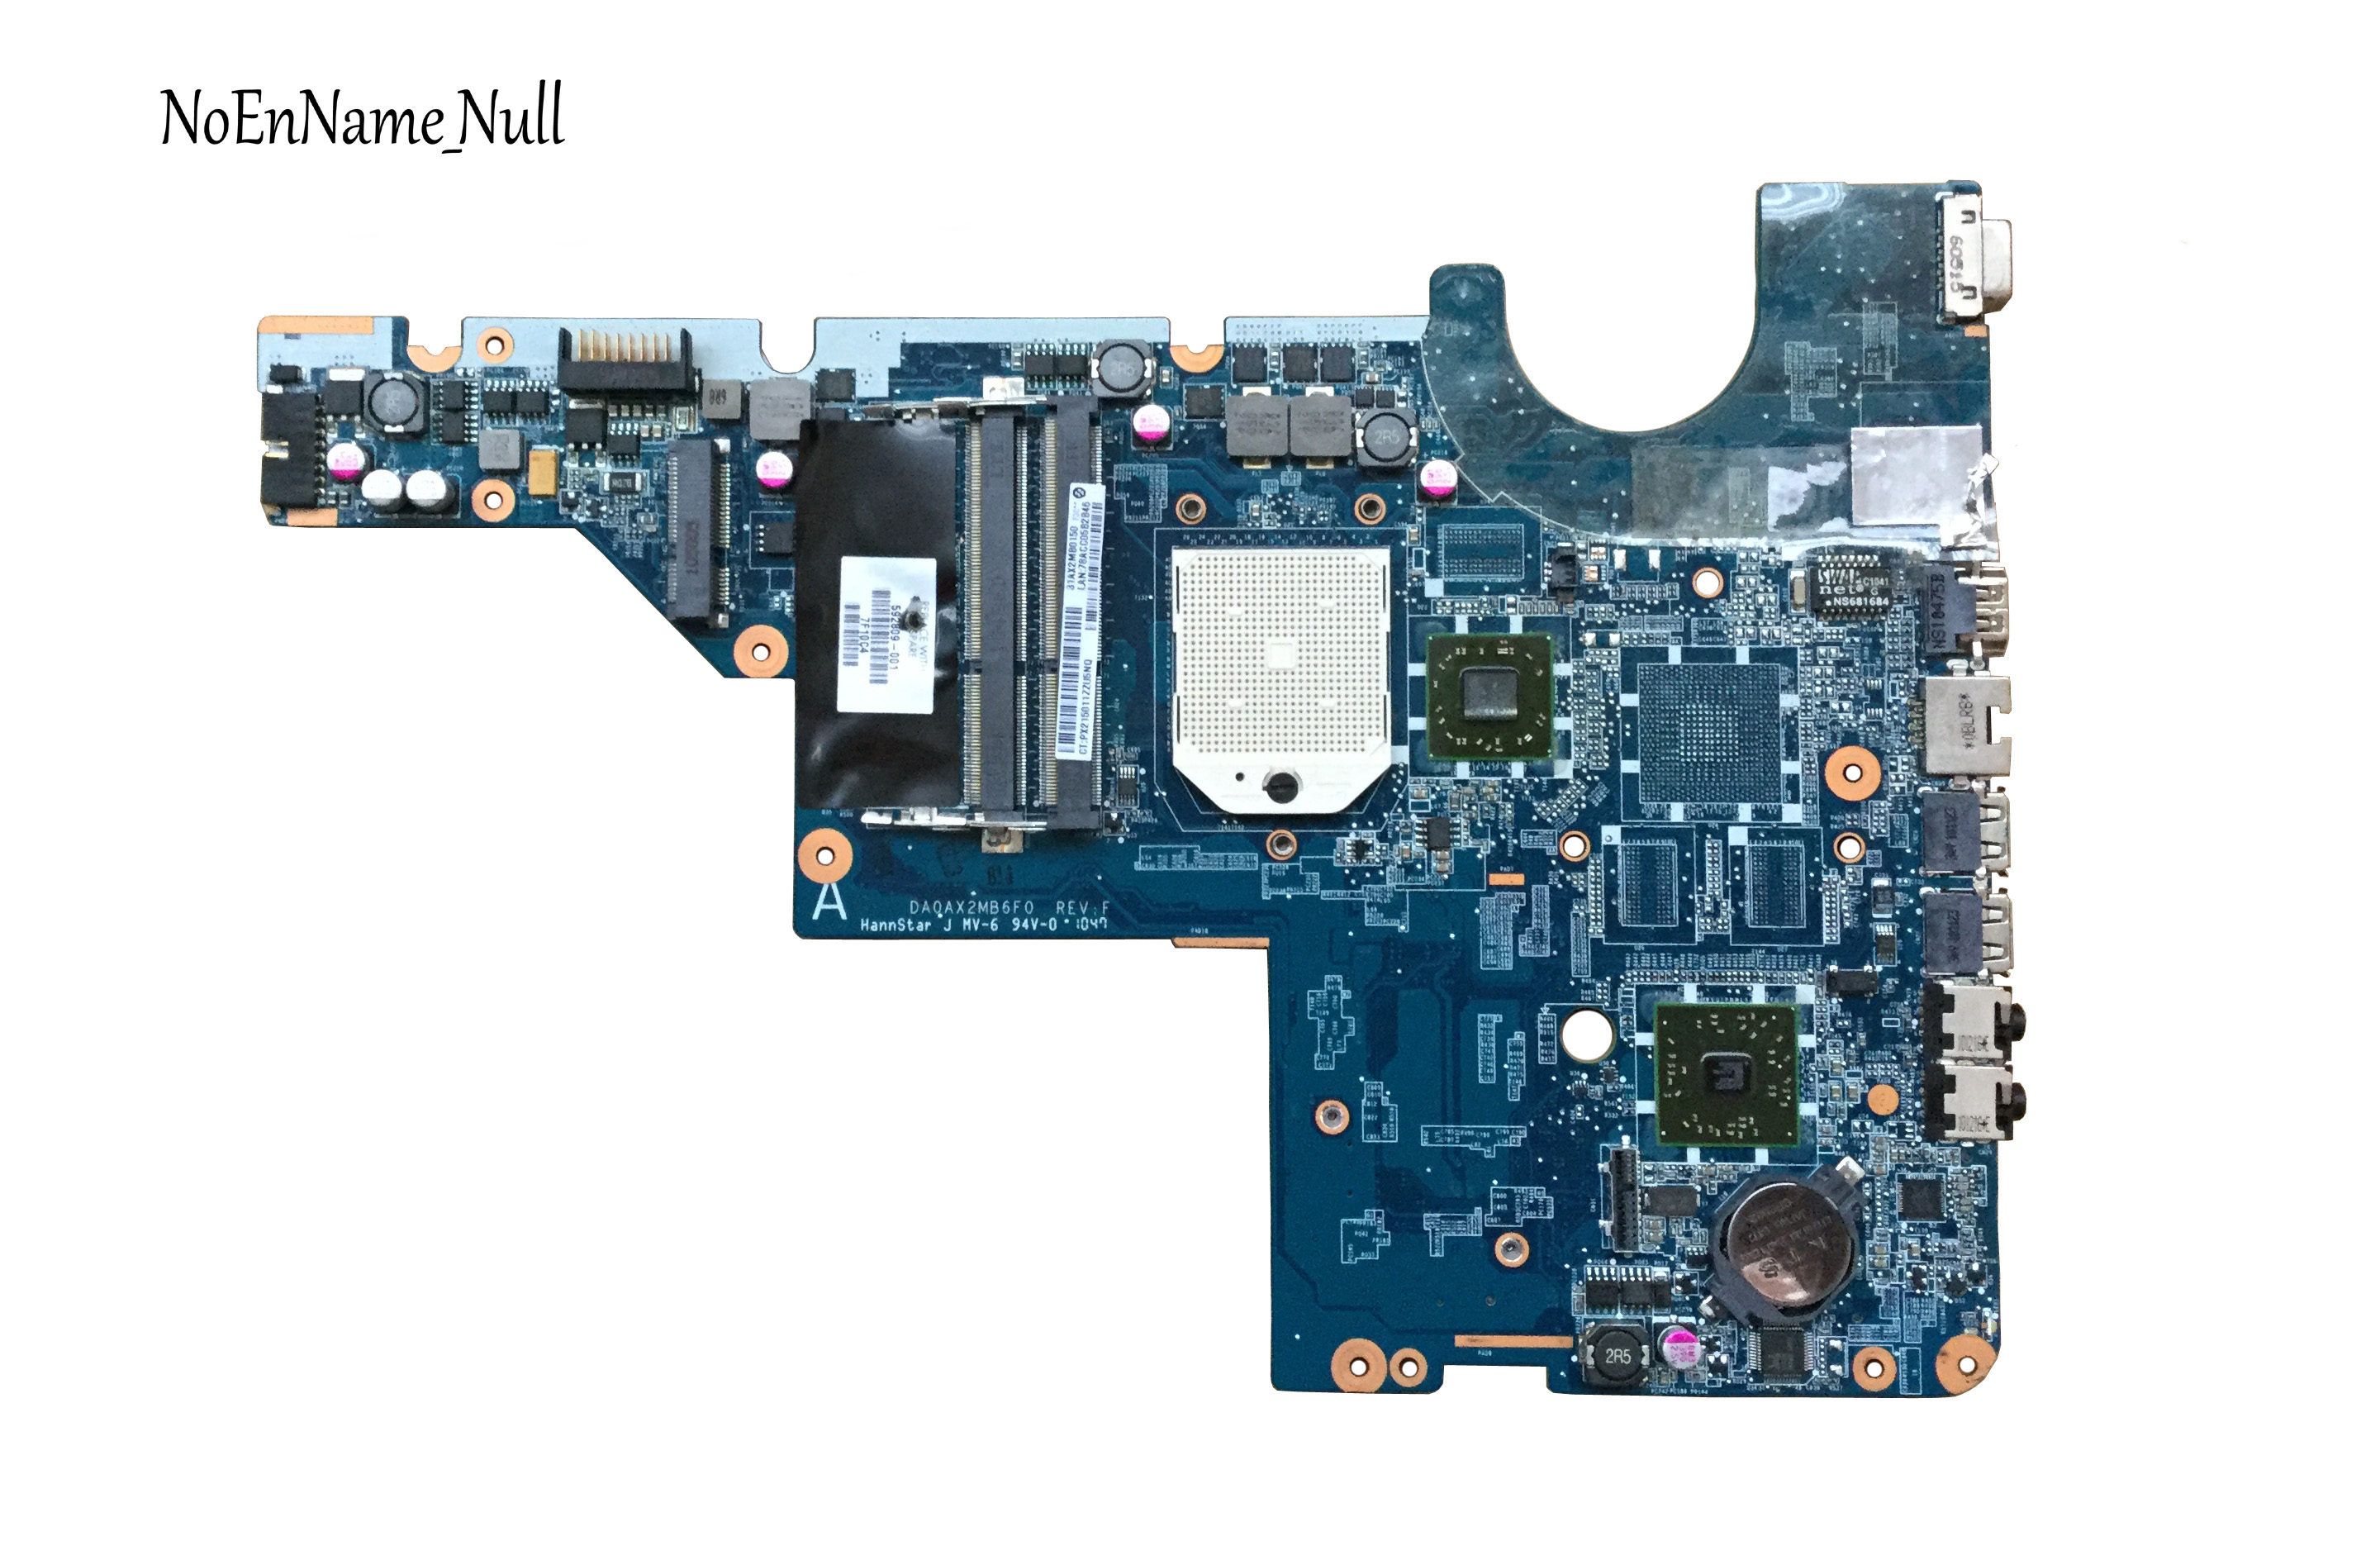 592809-001 For HP G62 CQ62 CQ42 G42 Motherboard DA0AX2MB6E0 DA0AX2MB6E1 DA0AX2MB6F0 DDR3 Maiboard 100% Test Fast Ship